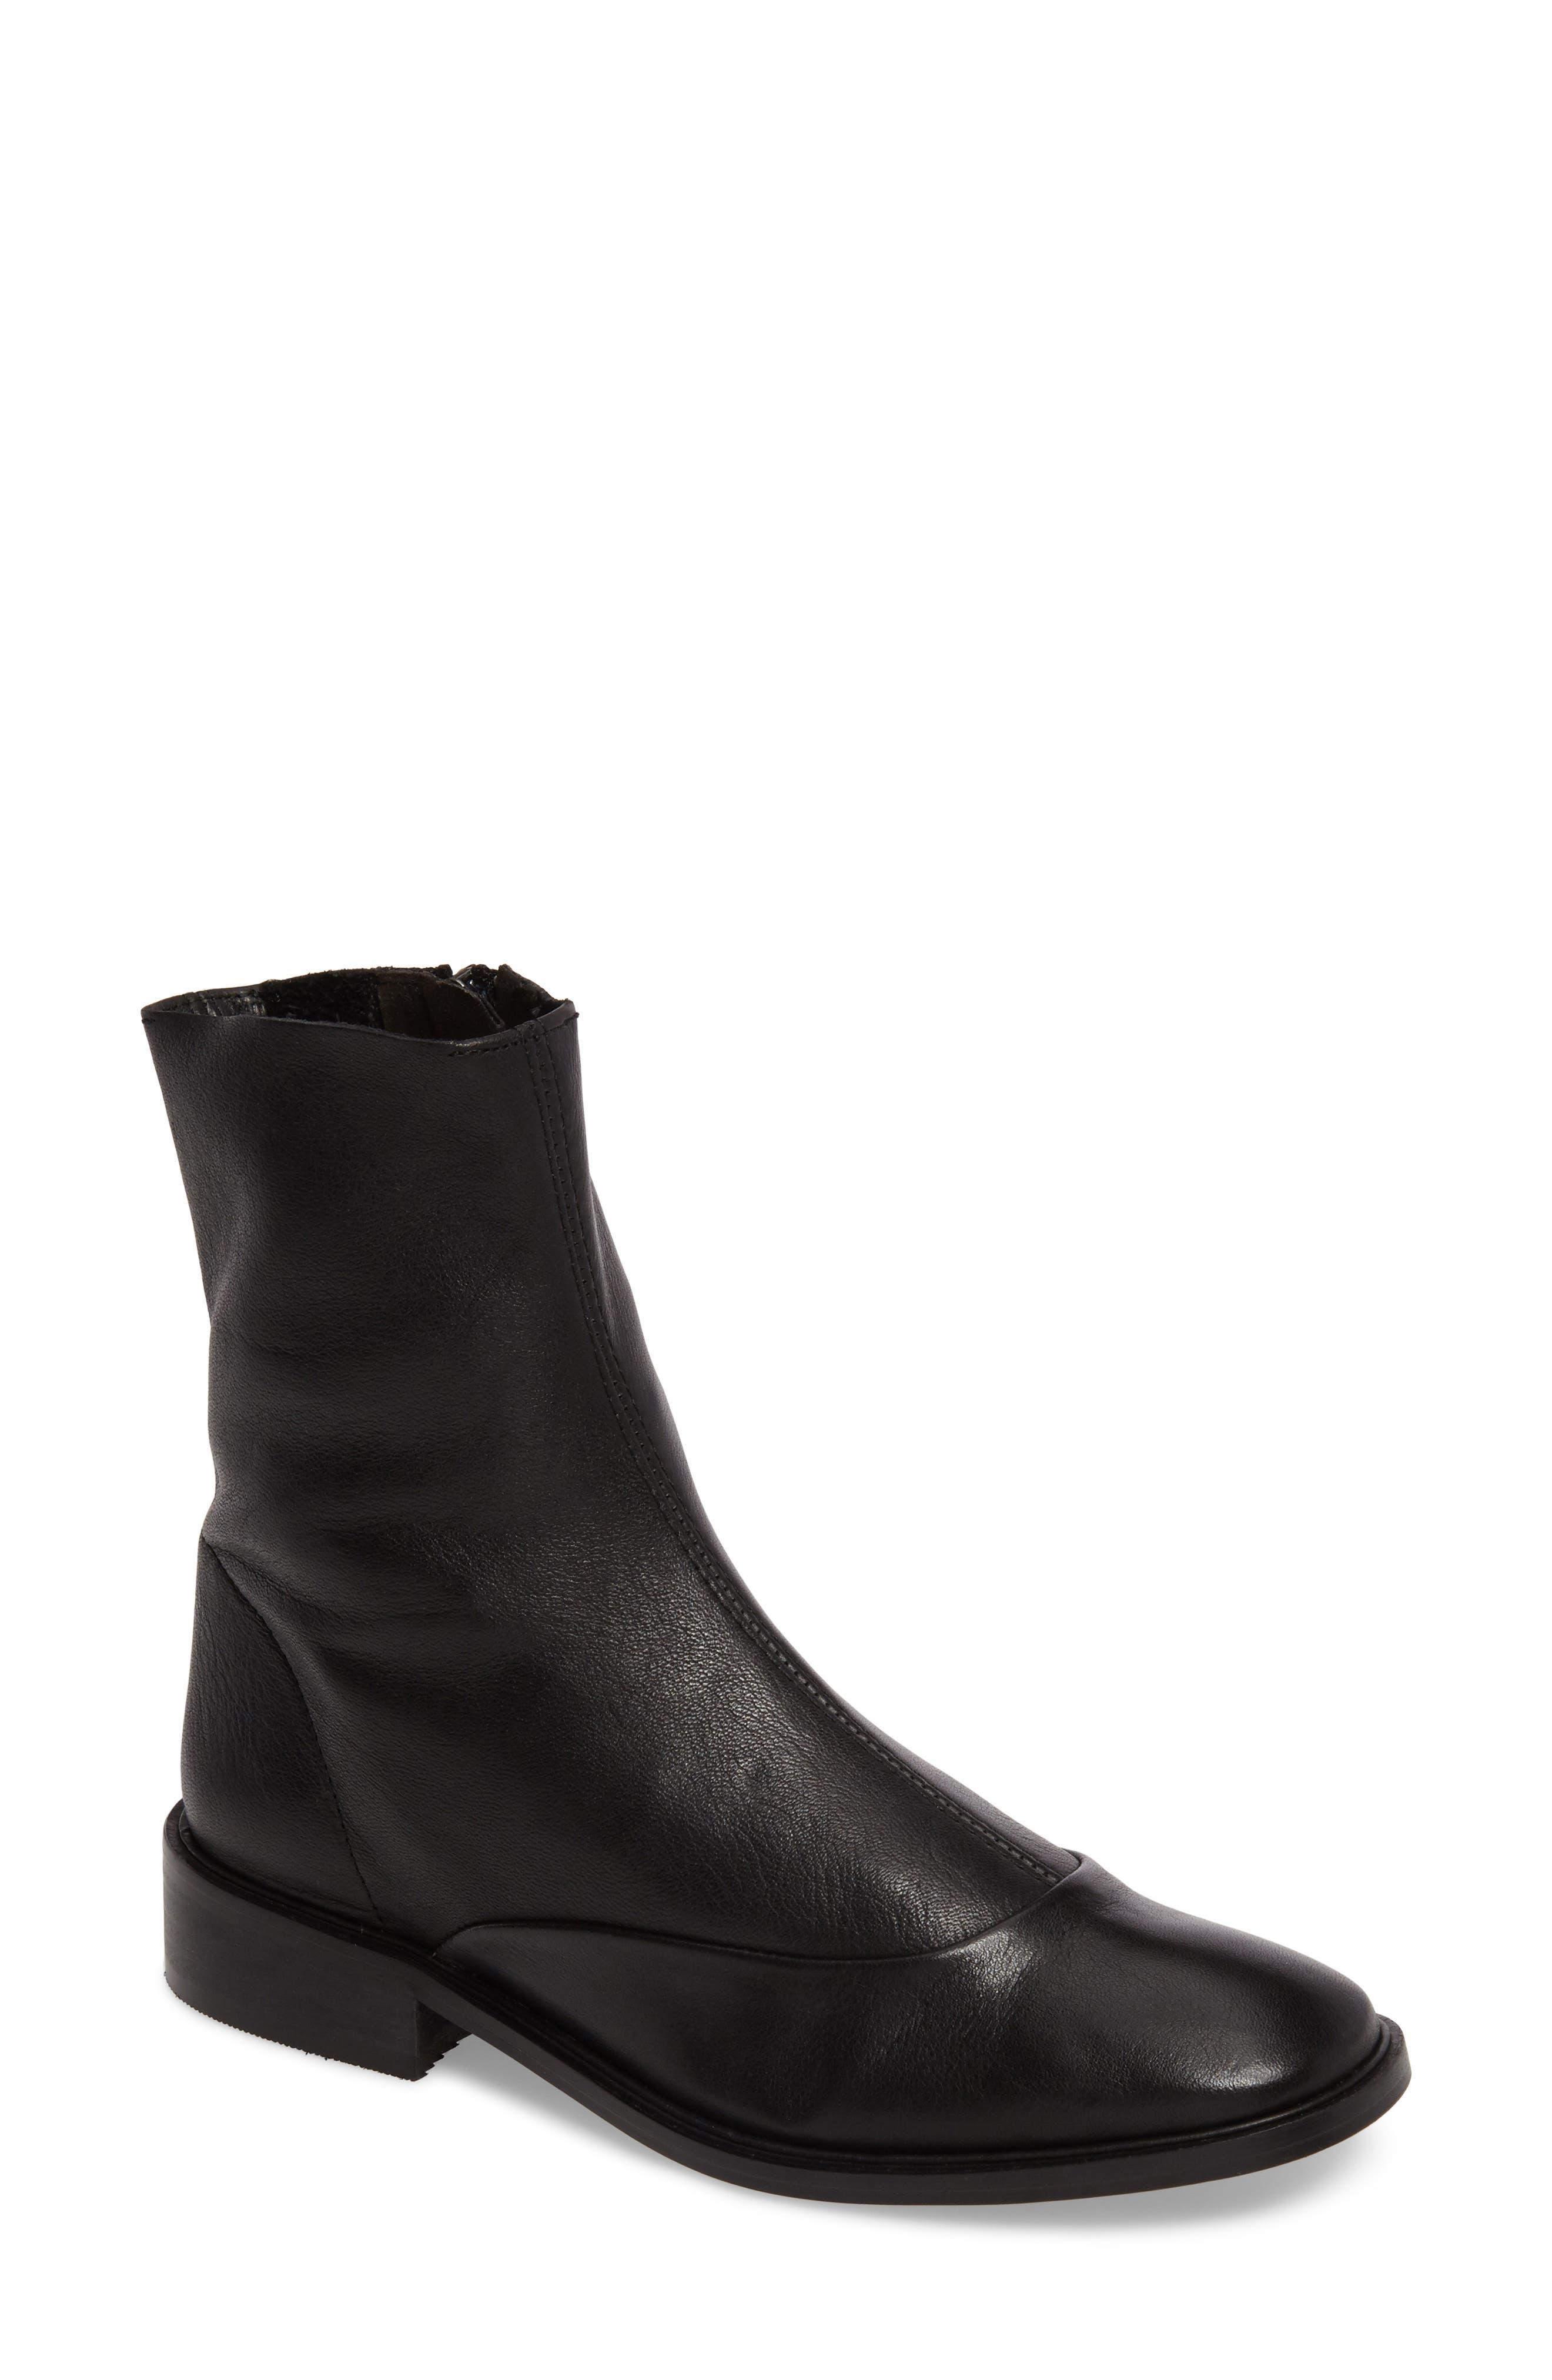 April Sock Boots,                             Main thumbnail 1, color,                             001